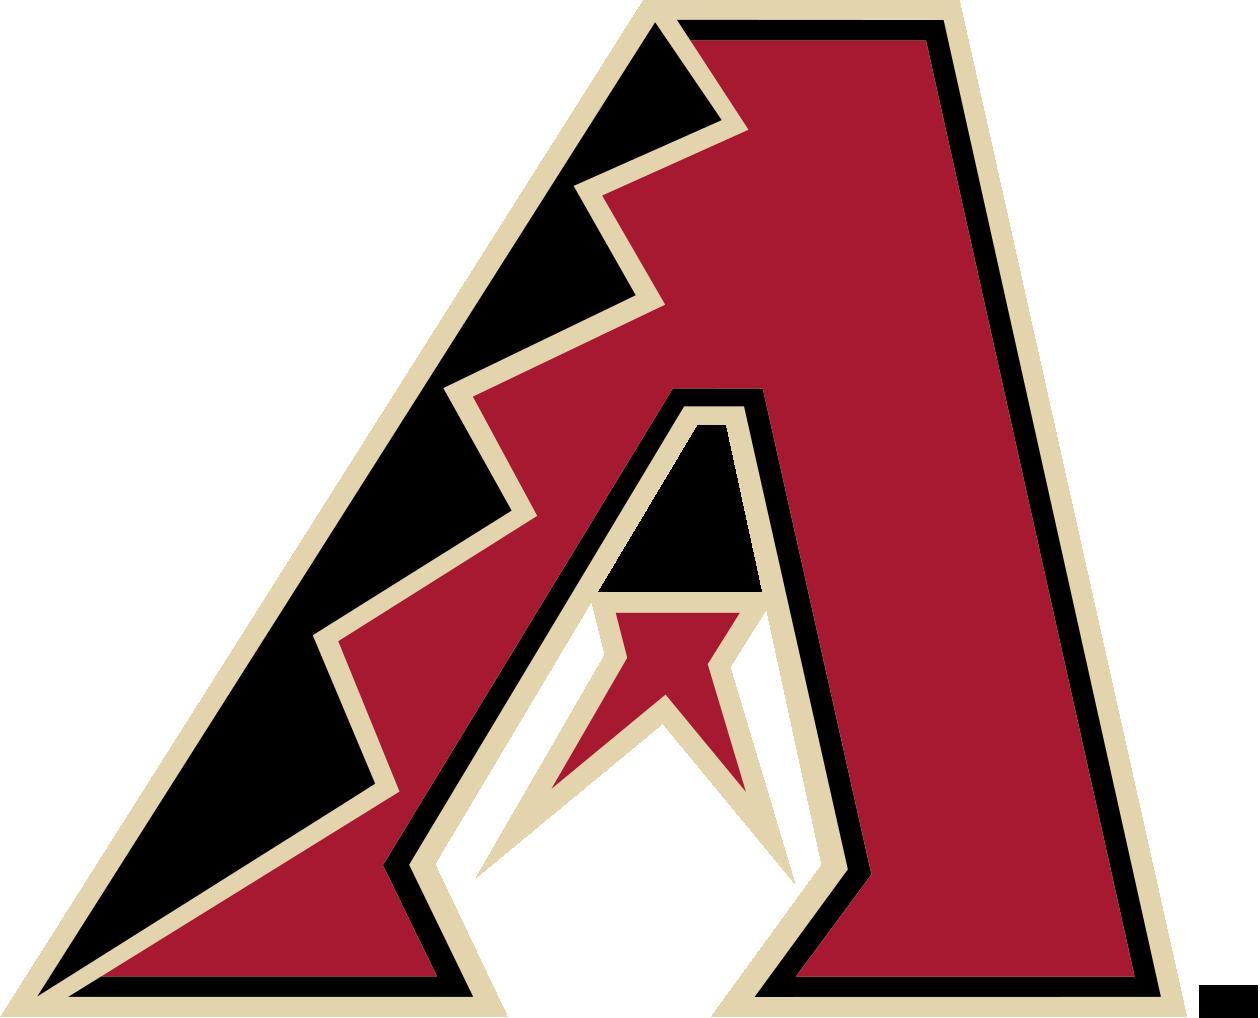 Arizona_Diamondbacks-logo-1200px.png